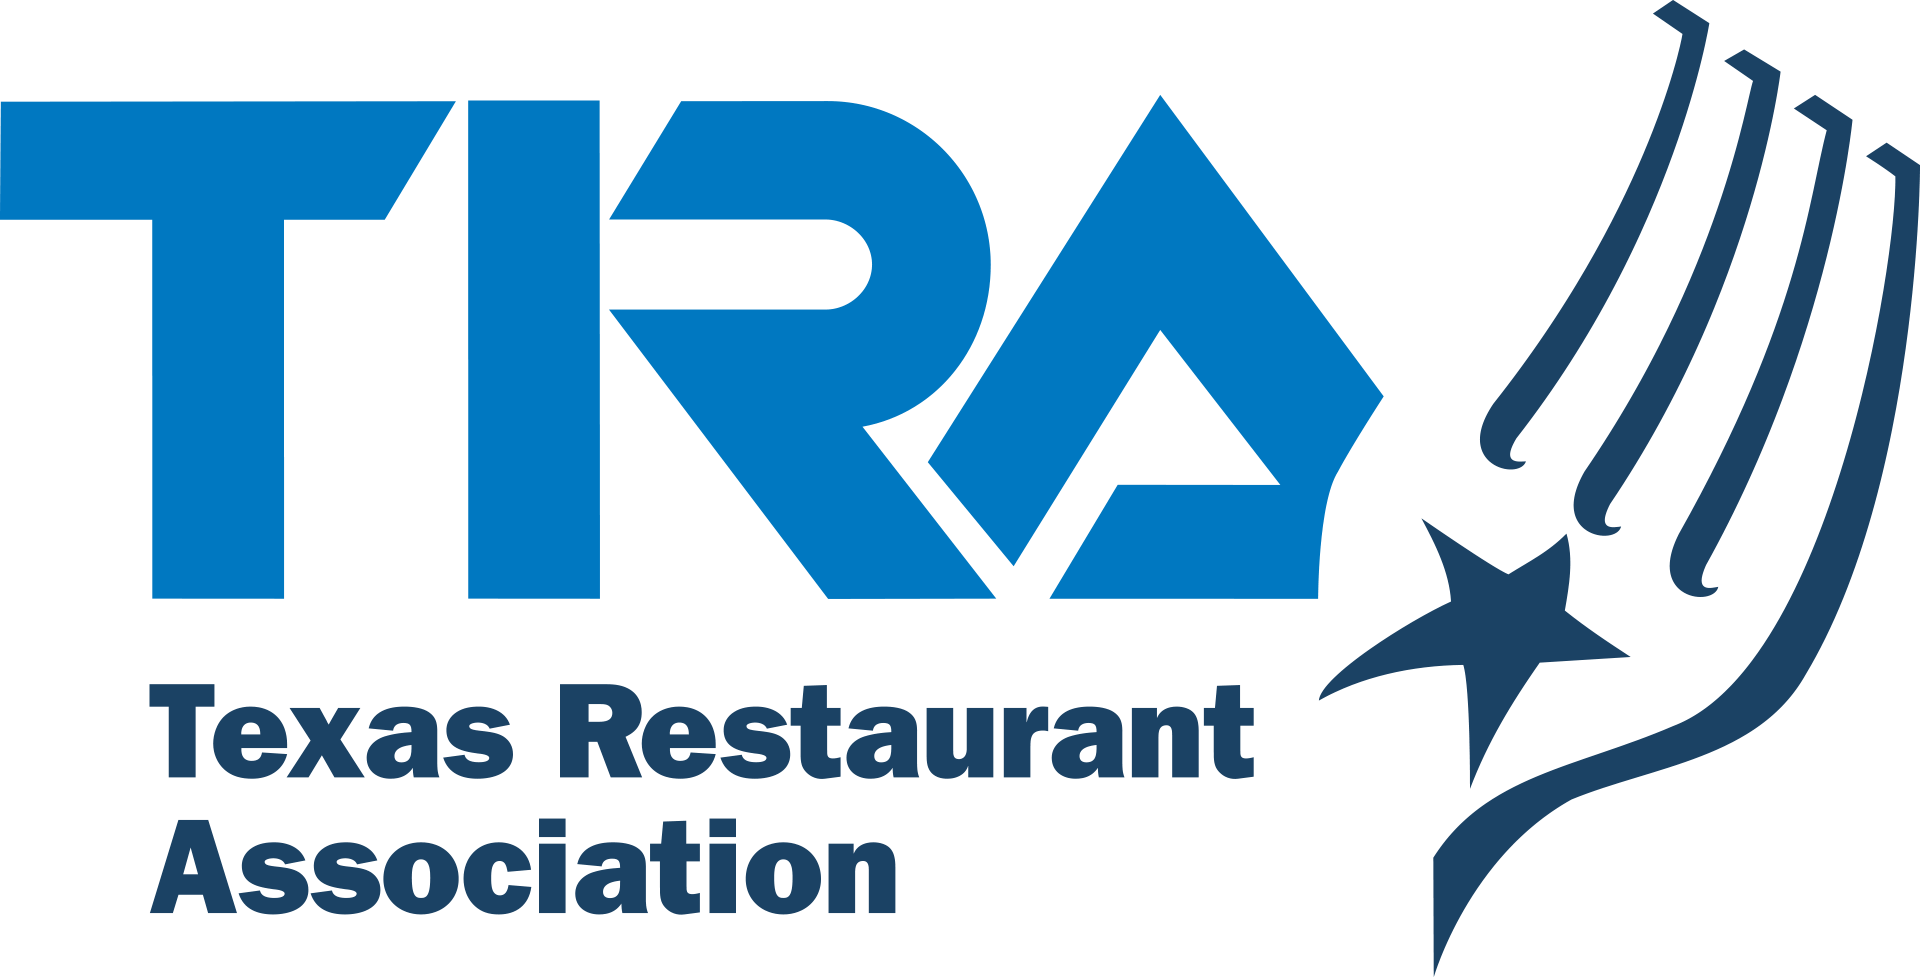 Texas Restaurant Association logo